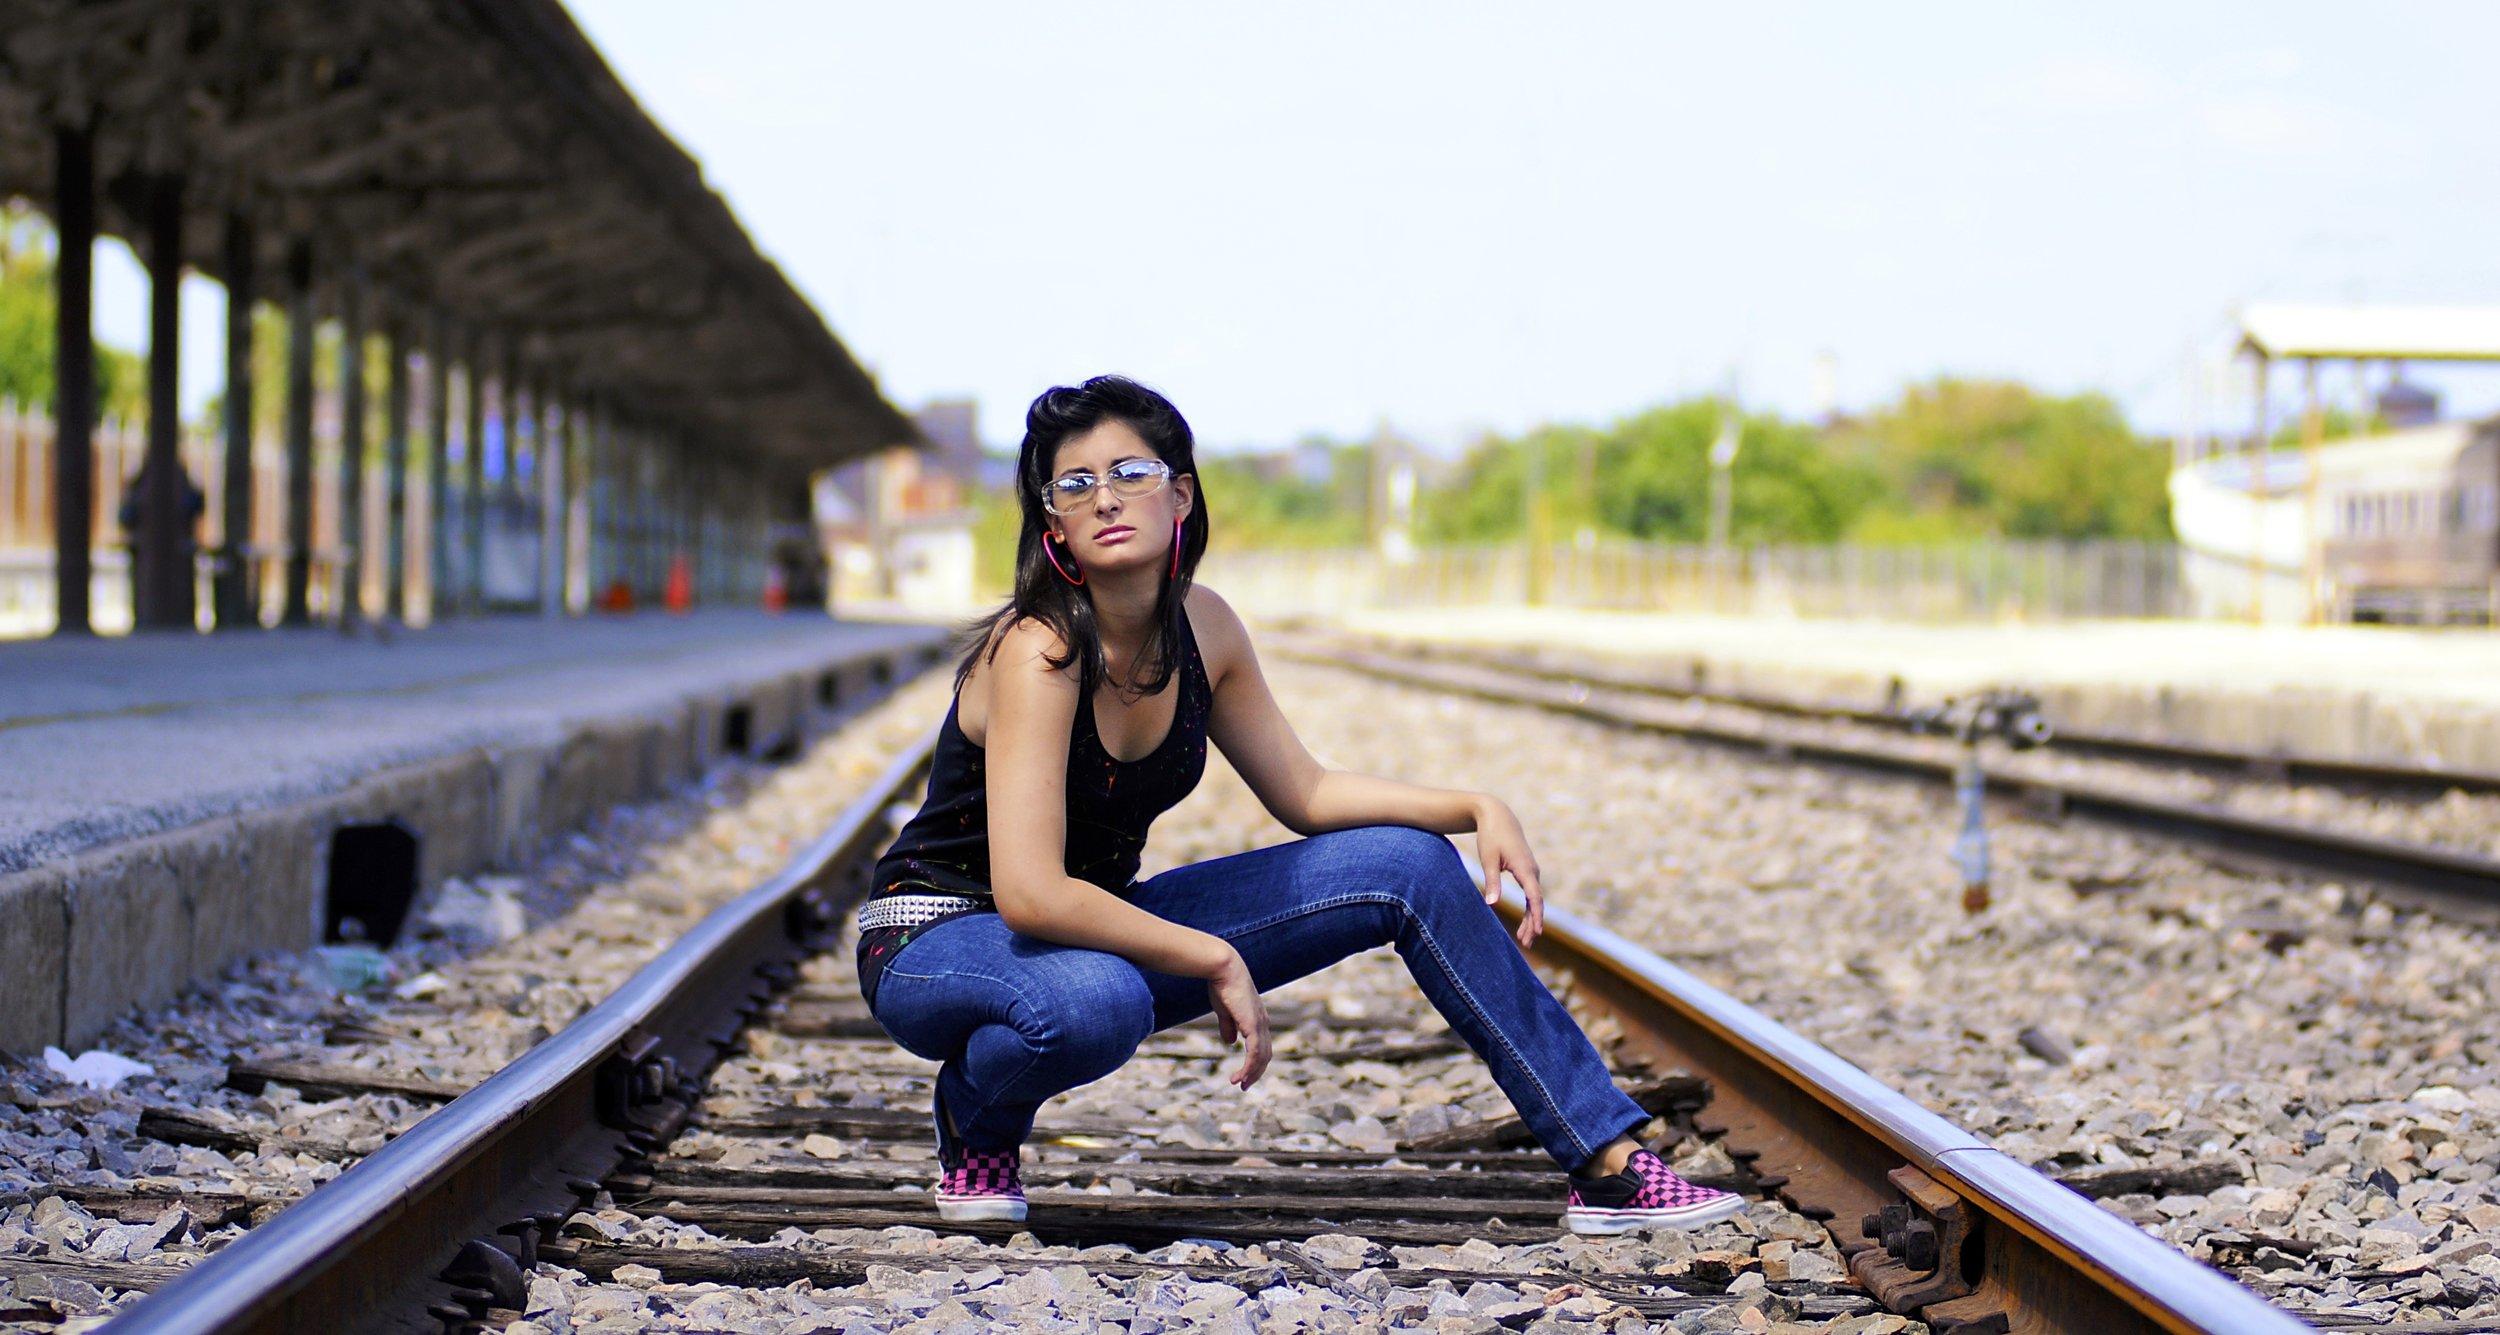 Katie-on-the-tracks-may-2012-edit.jpg